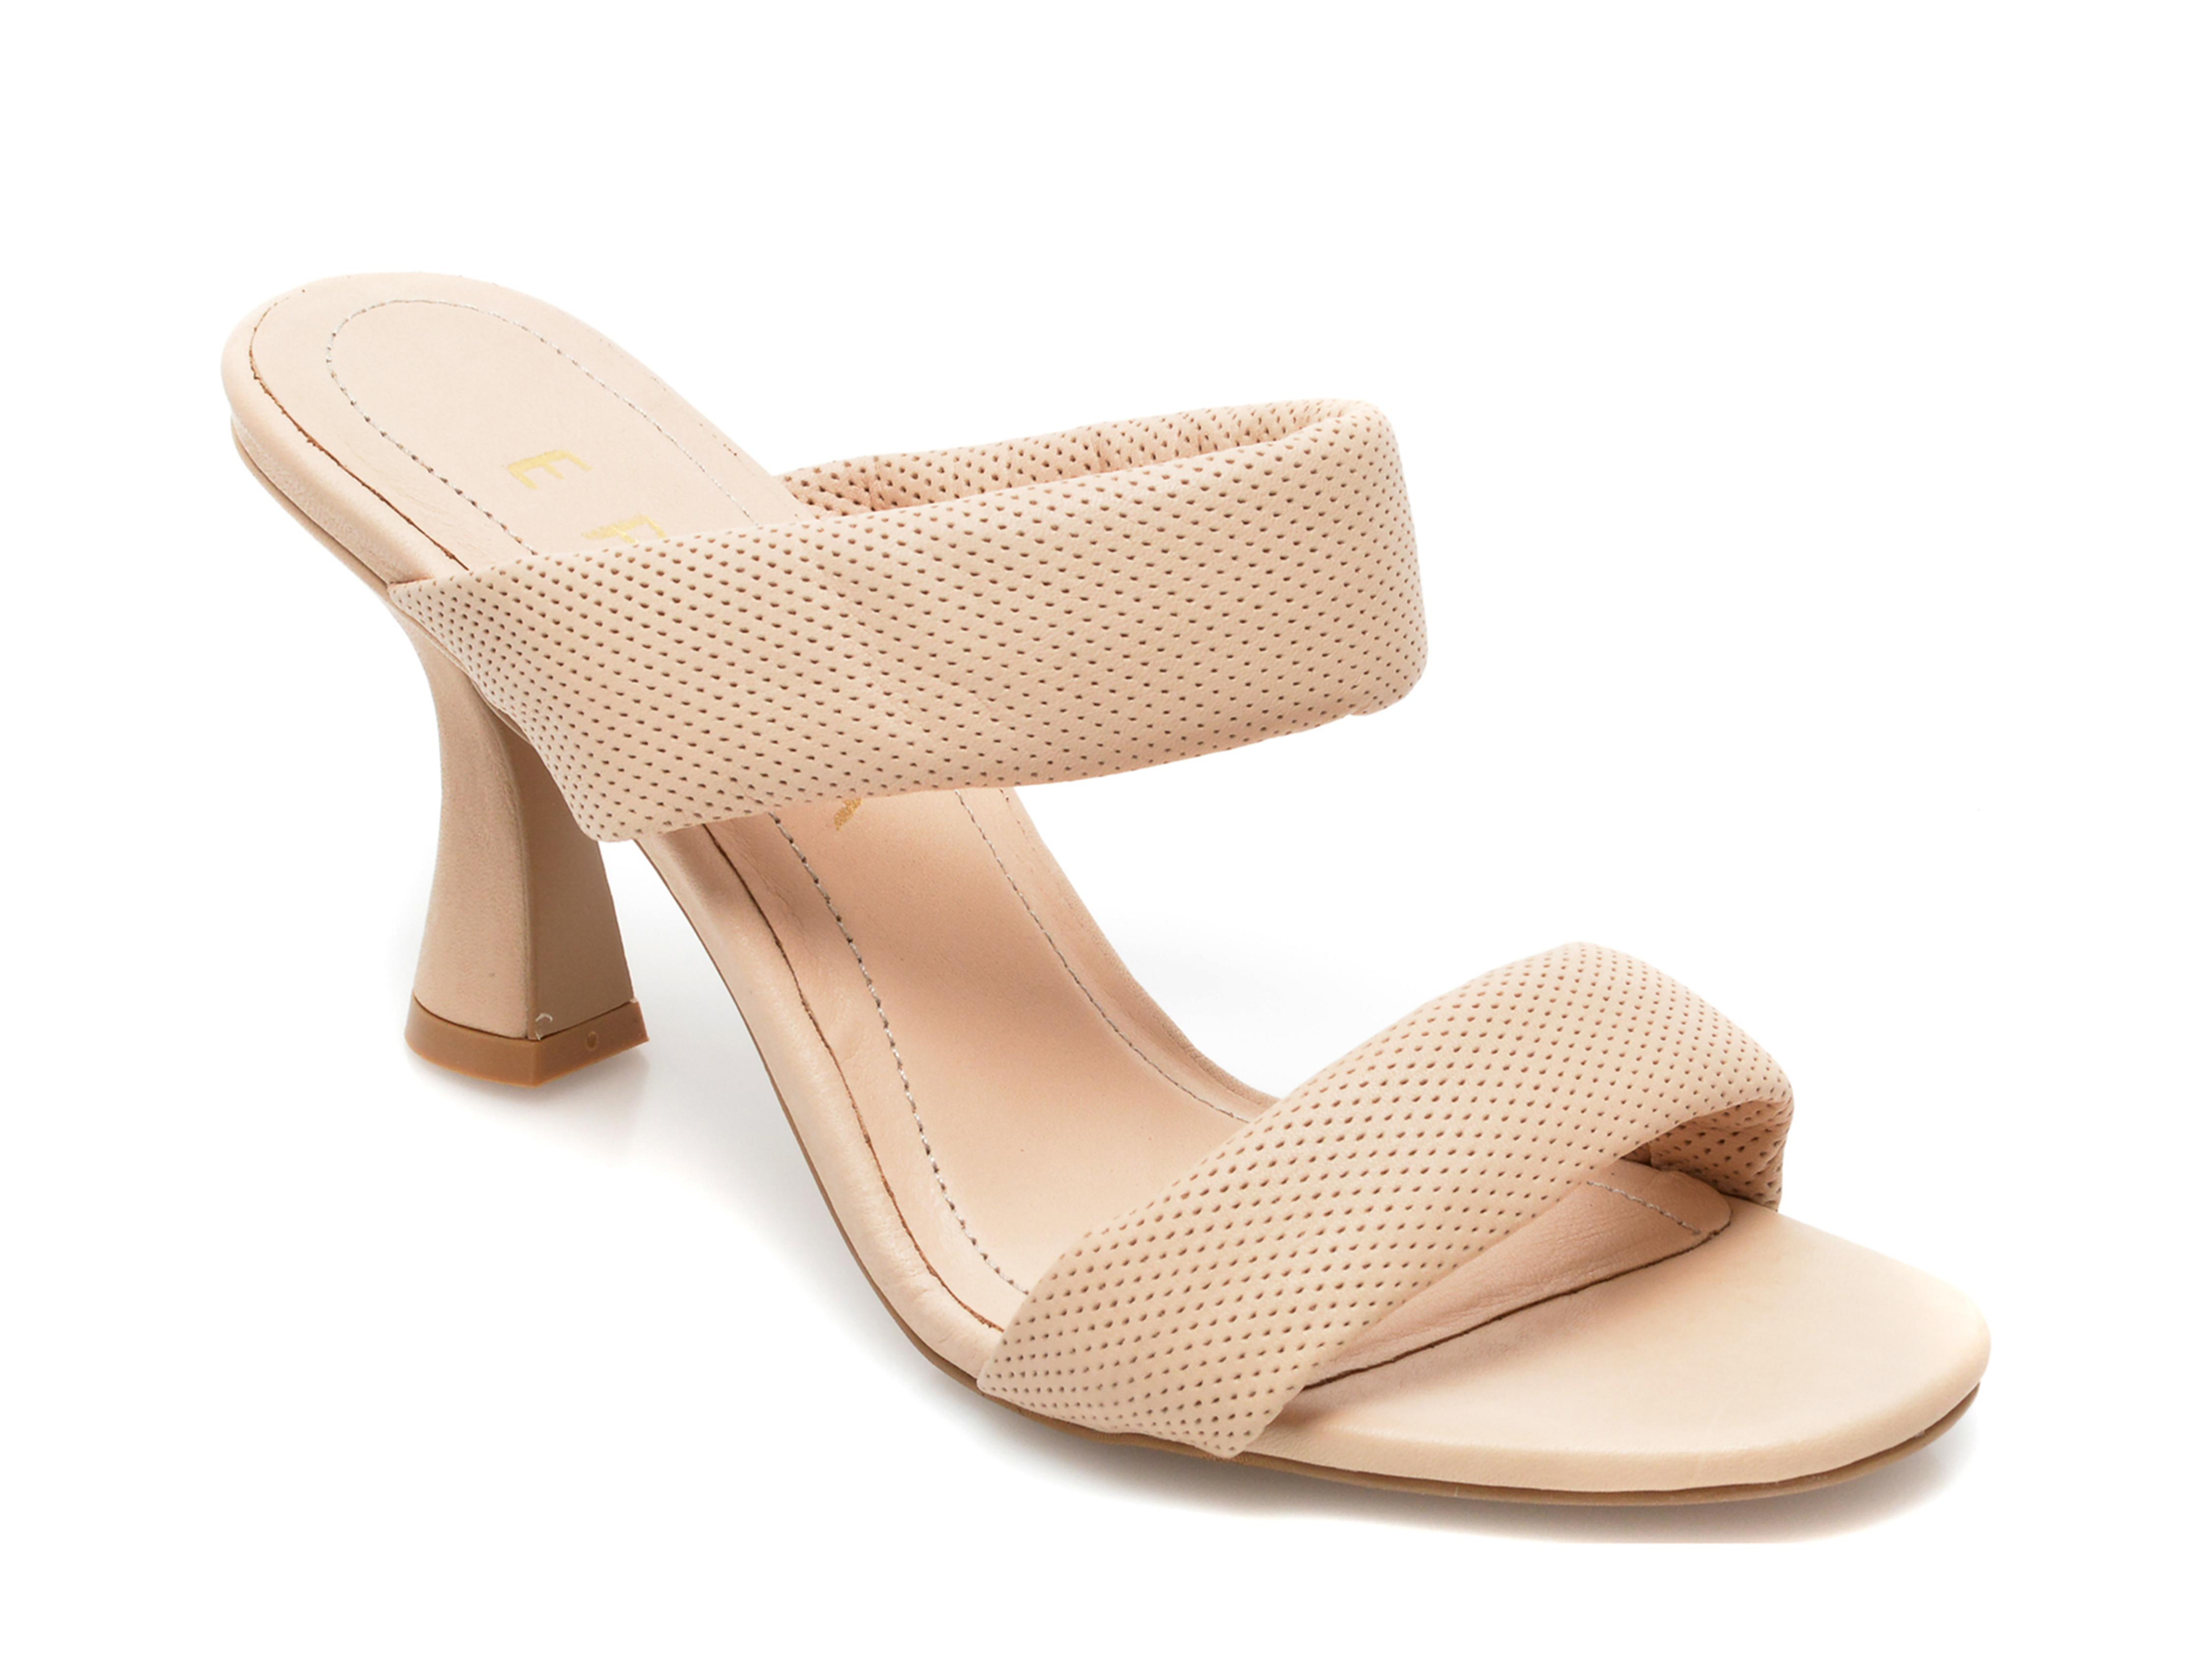 Papuci EPICA bej, 4110, din piele naturala imagine otter.ro 2021